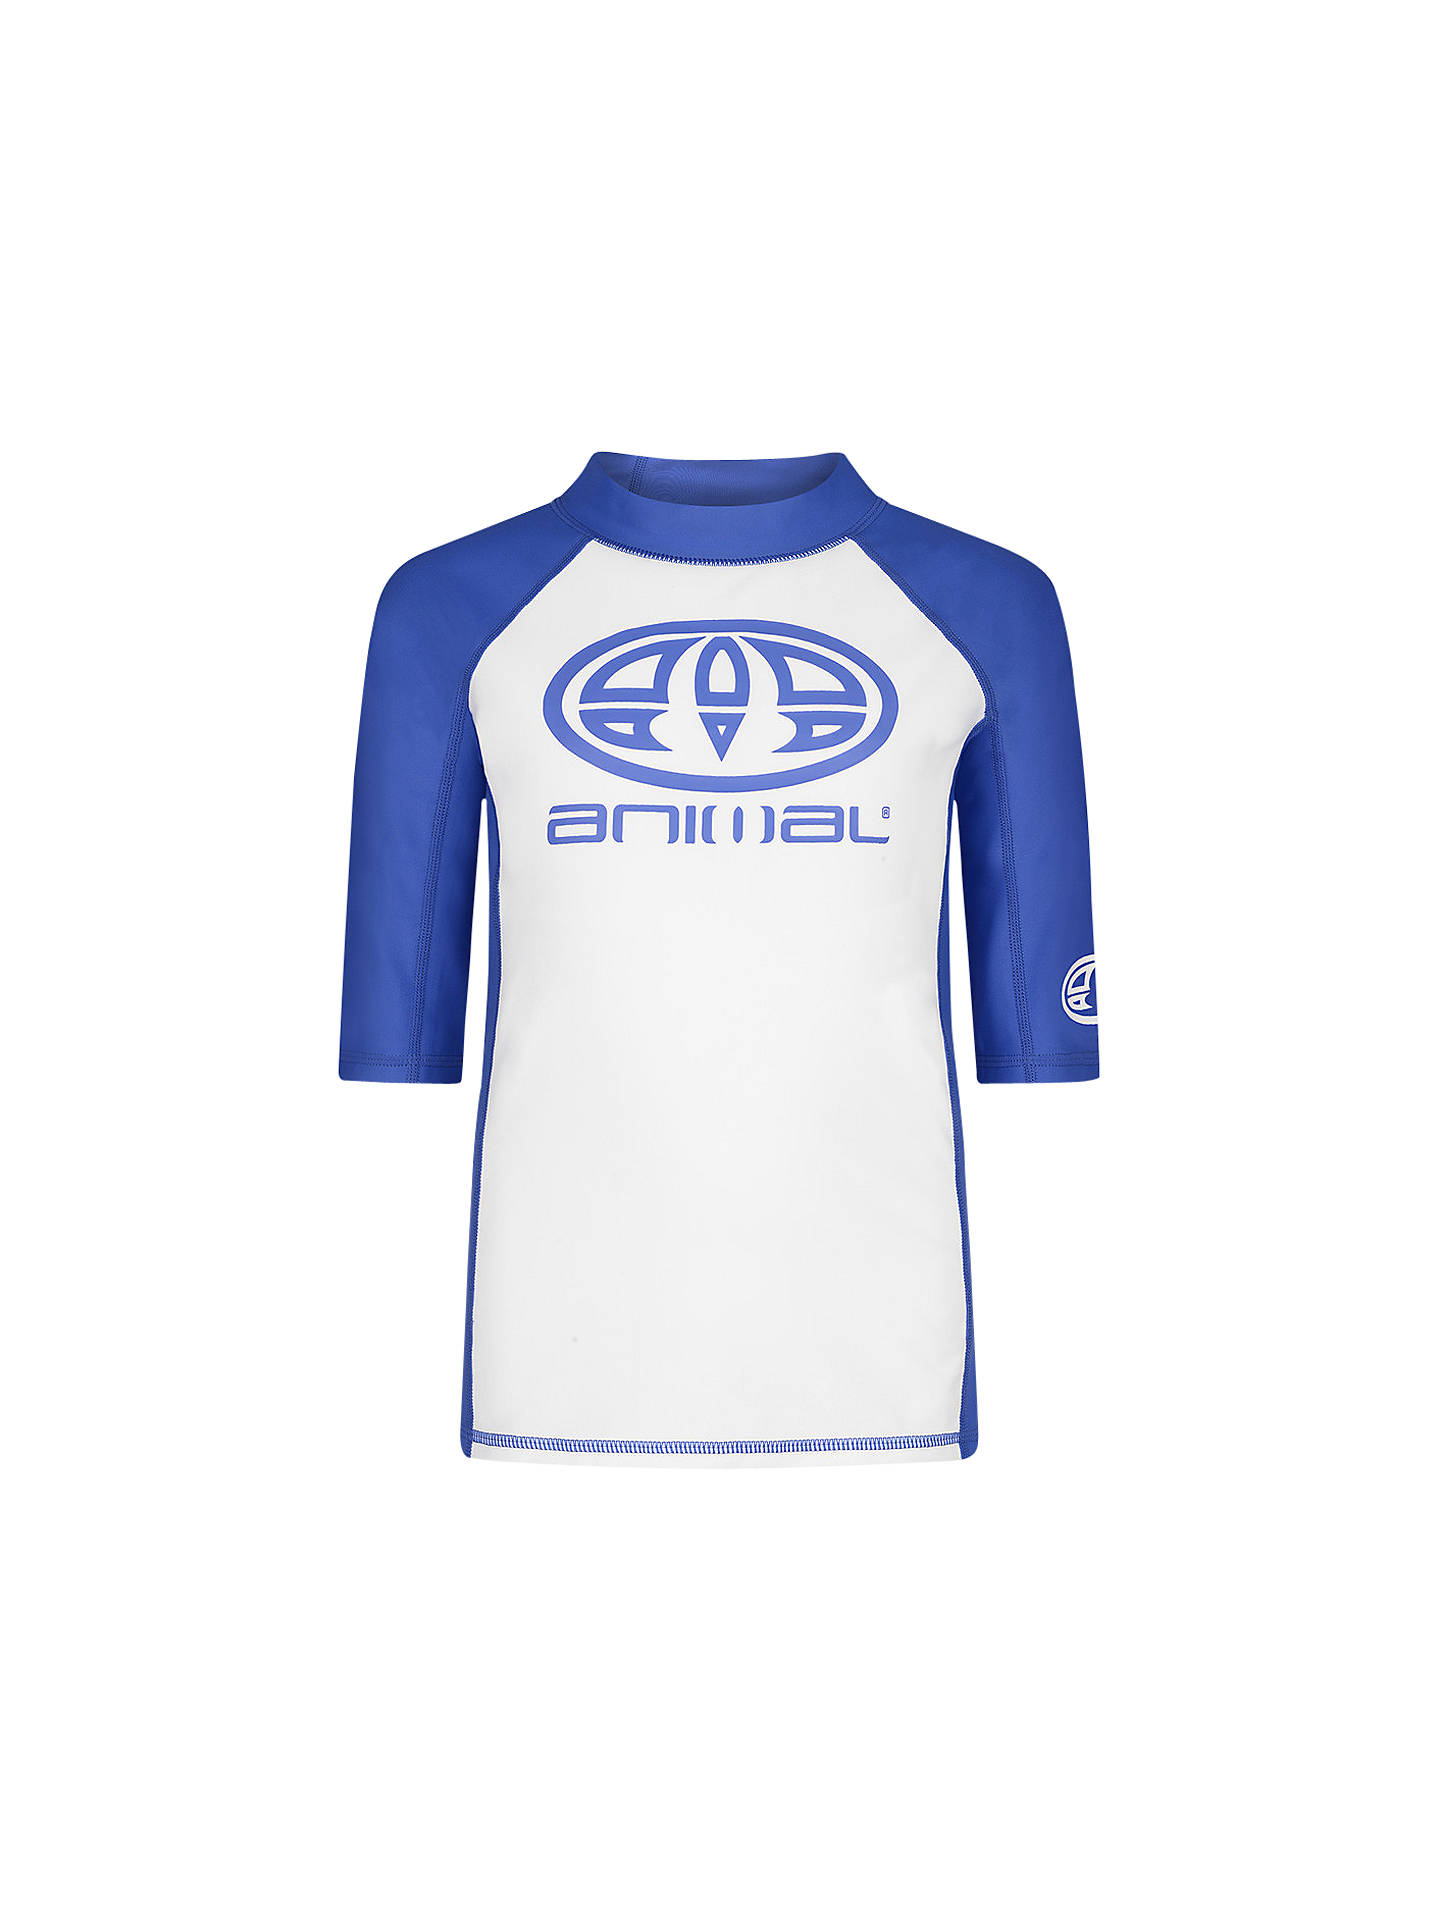 01c632a599 Buy Animal Boys' Hiltern Rash Vest, Blue, 3-4 years Online at